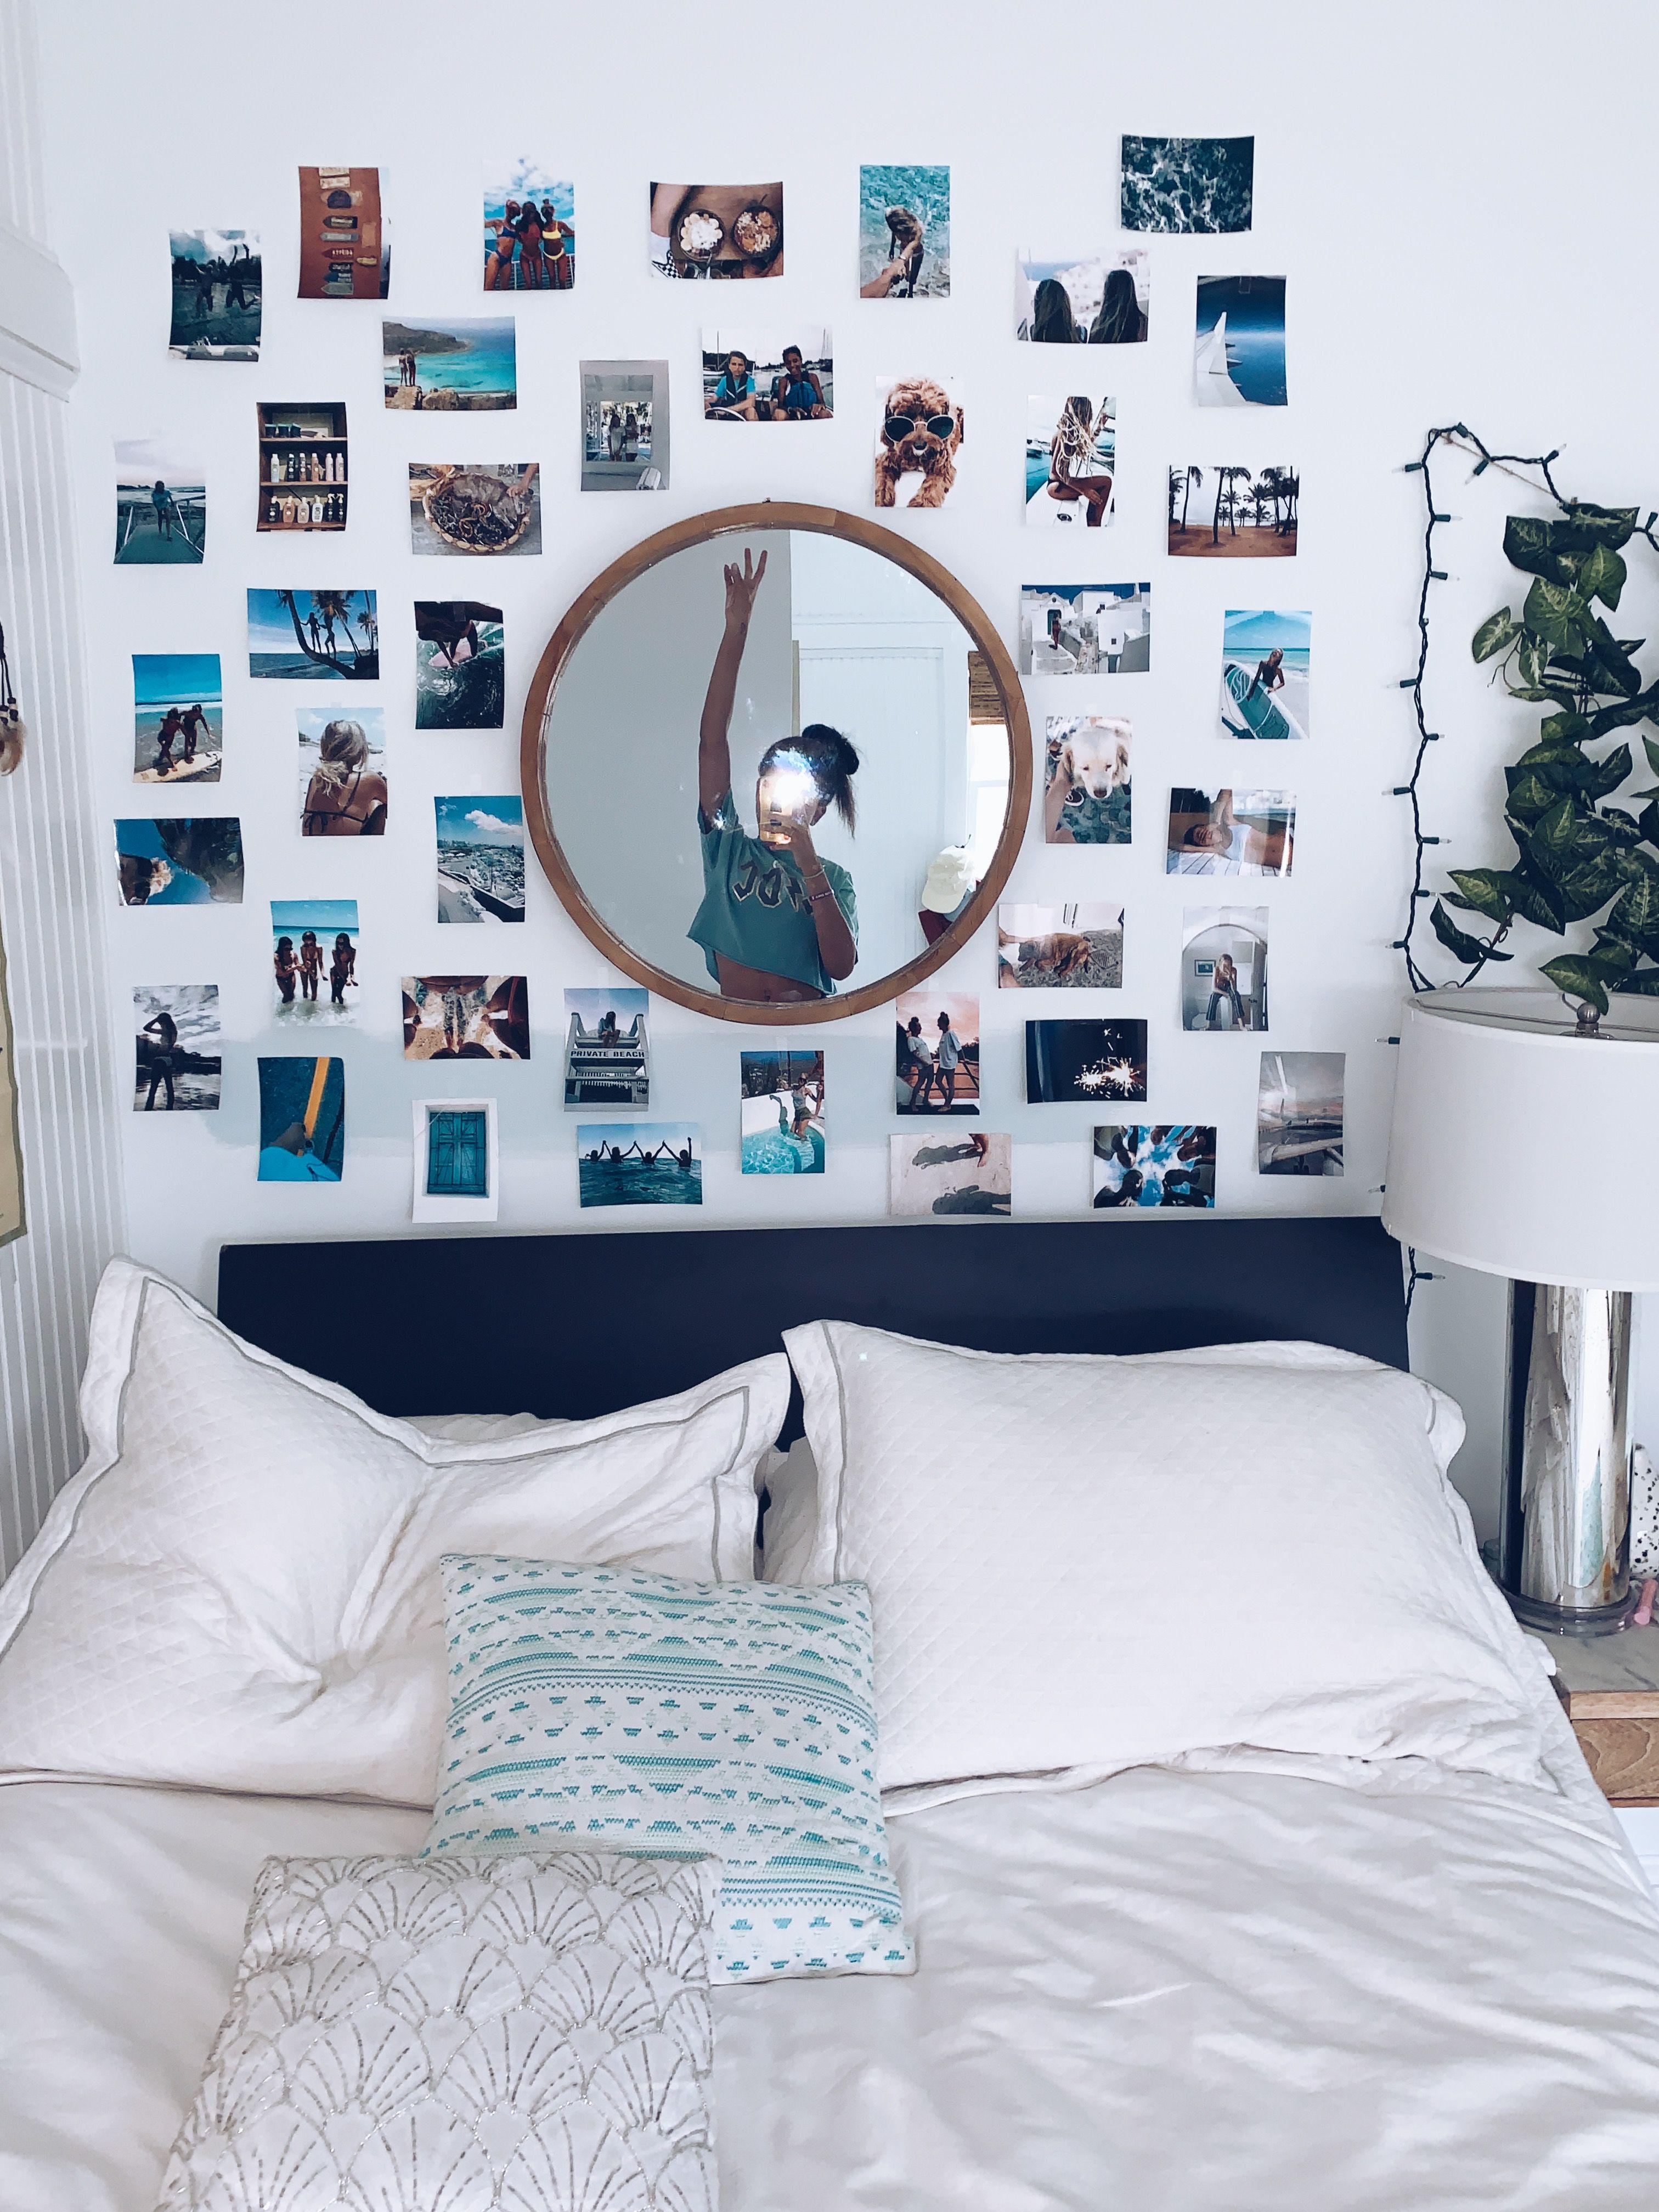 Pinterest Loveglo3 Photo Walls Bedroom Dorm Room Decor Redecorate Bedroom